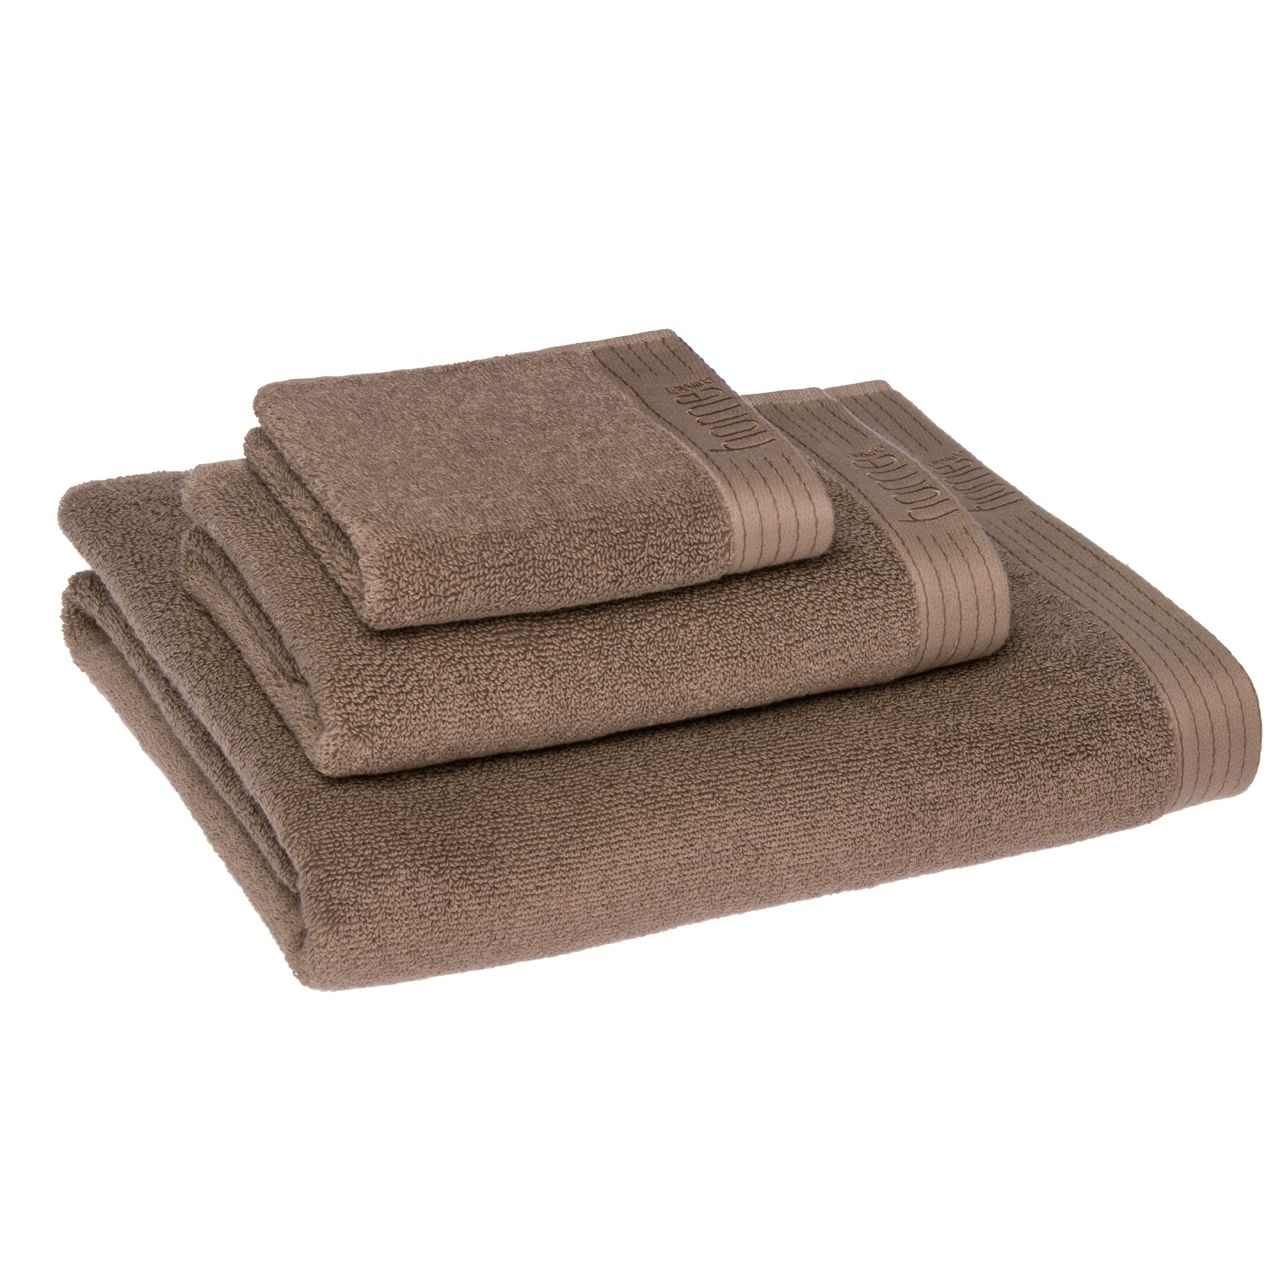 Bath Linen - 100% Cotton http://www.homeconcept.pt/onlinestore/en ...